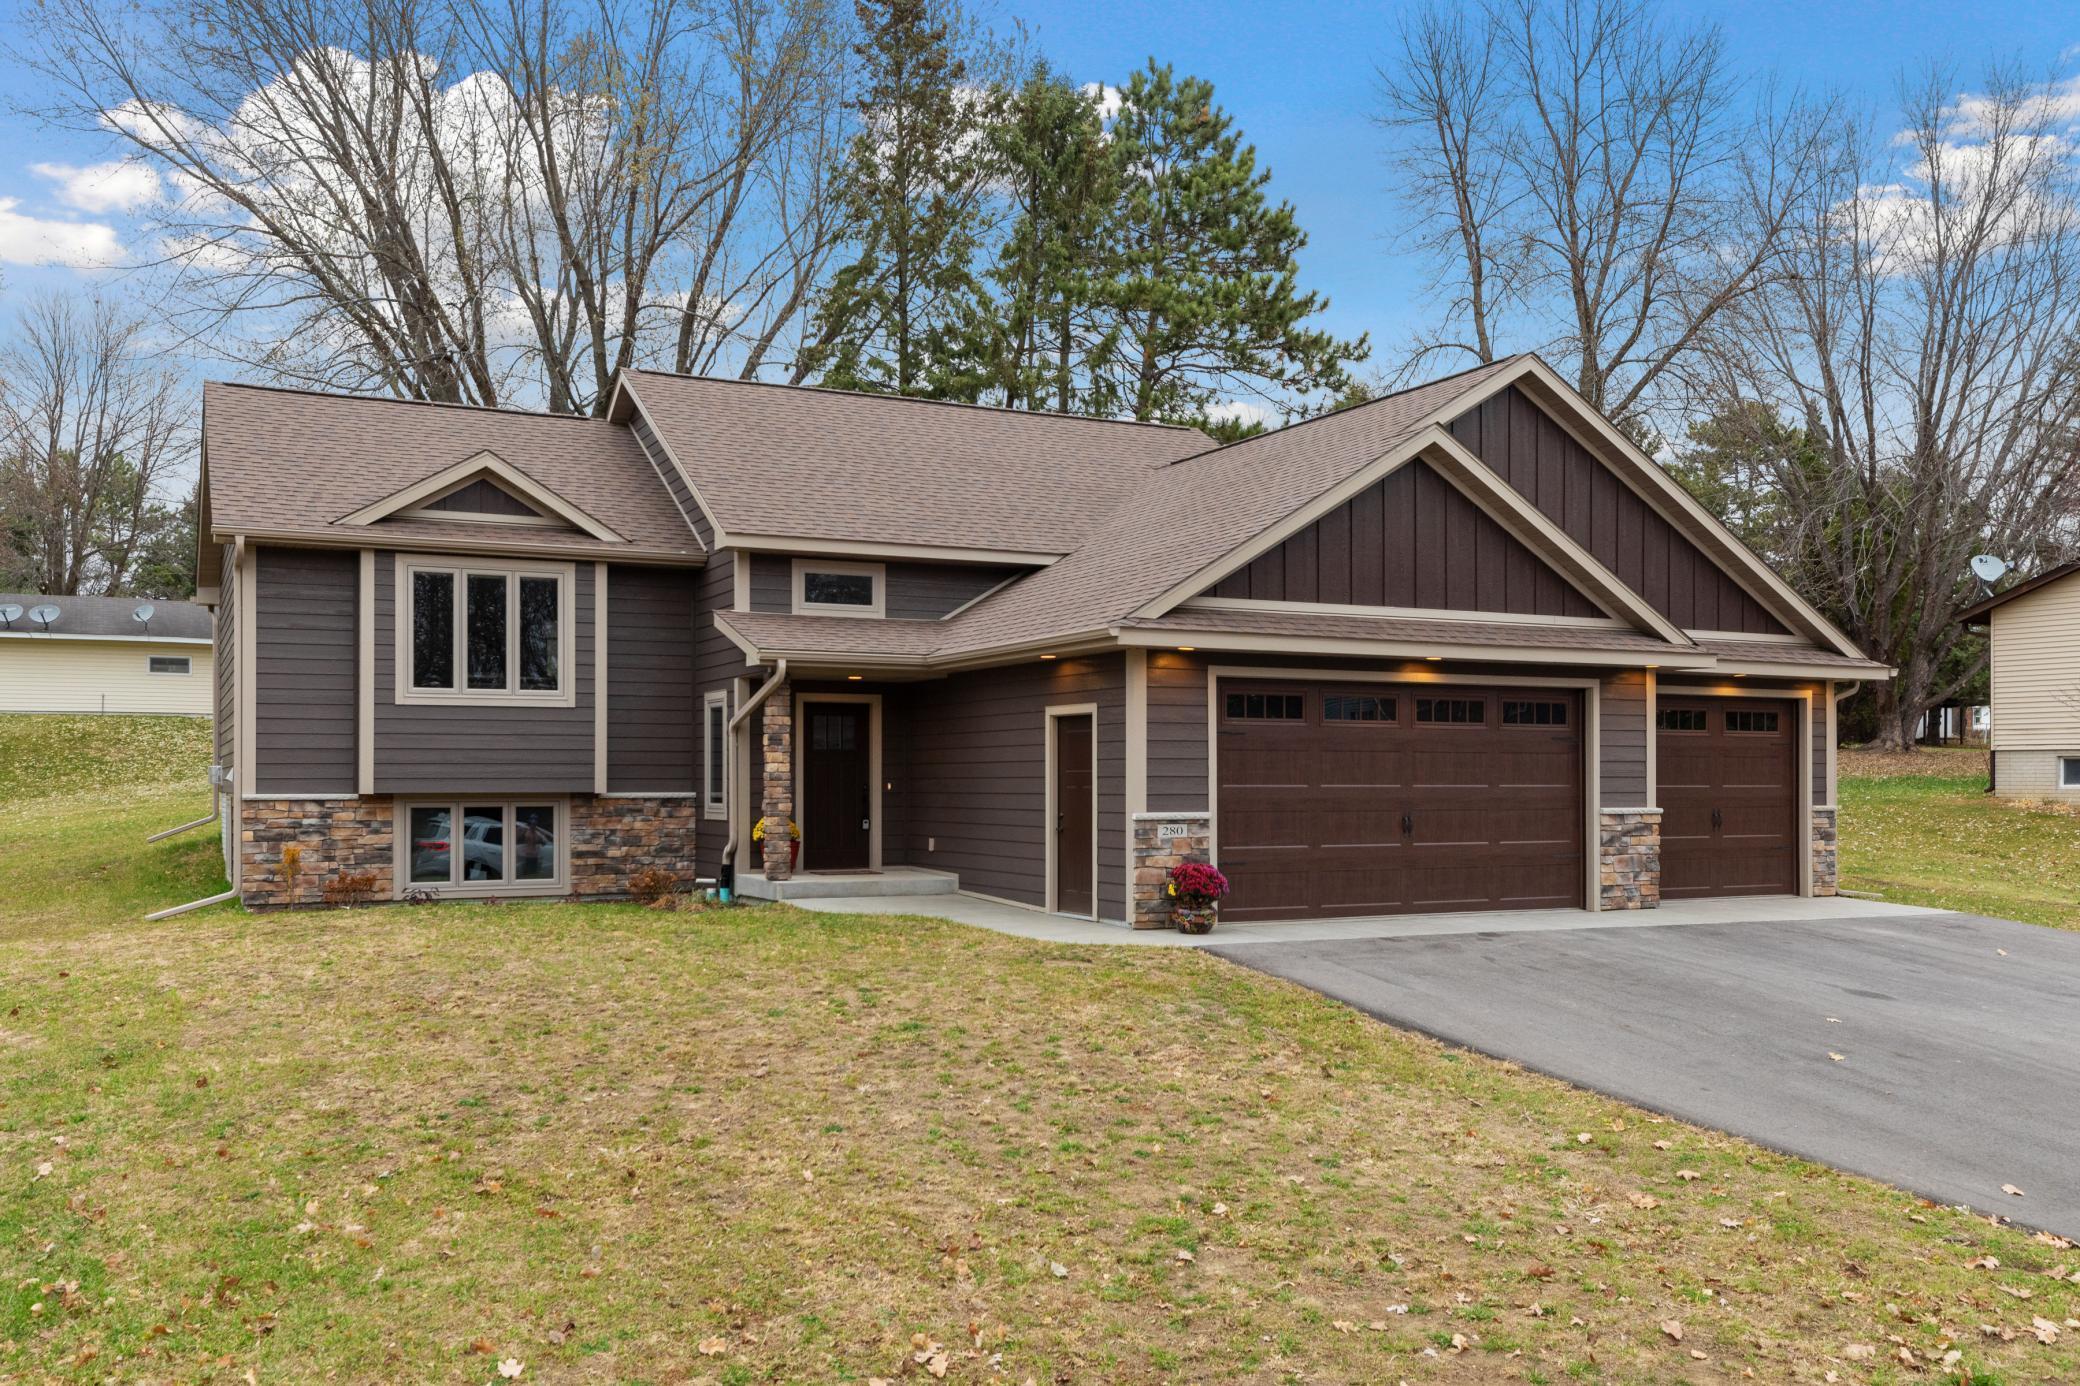 280 E Sunset Lane Property Photo - Ellsworth, WI real estate listing